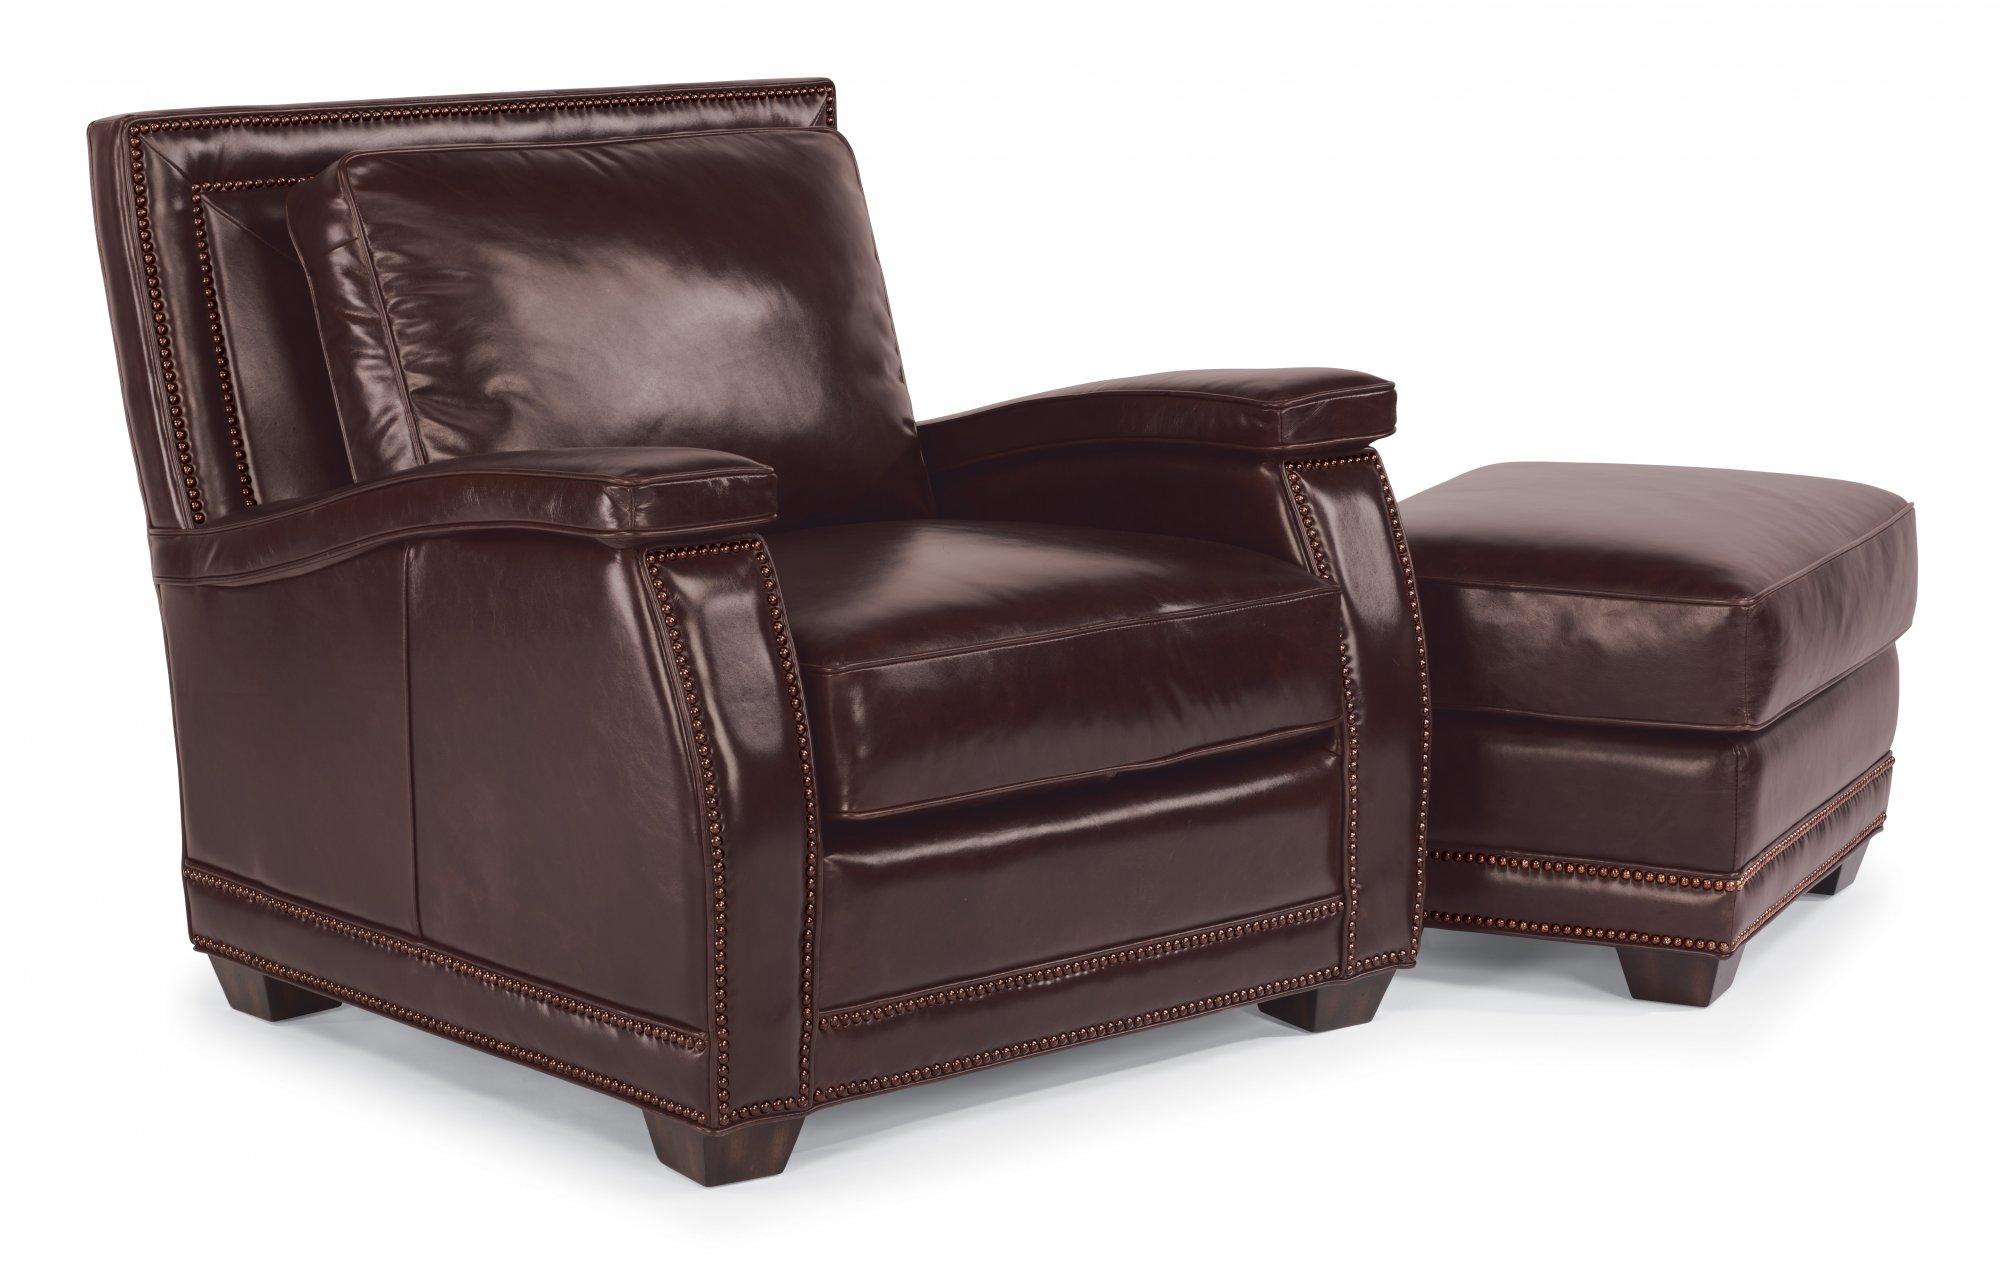 Marvelous Flexsteel Raleigh Chair 1260 10 Appliance Center Evergreenethics Interior Chair Design Evergreenethicsorg